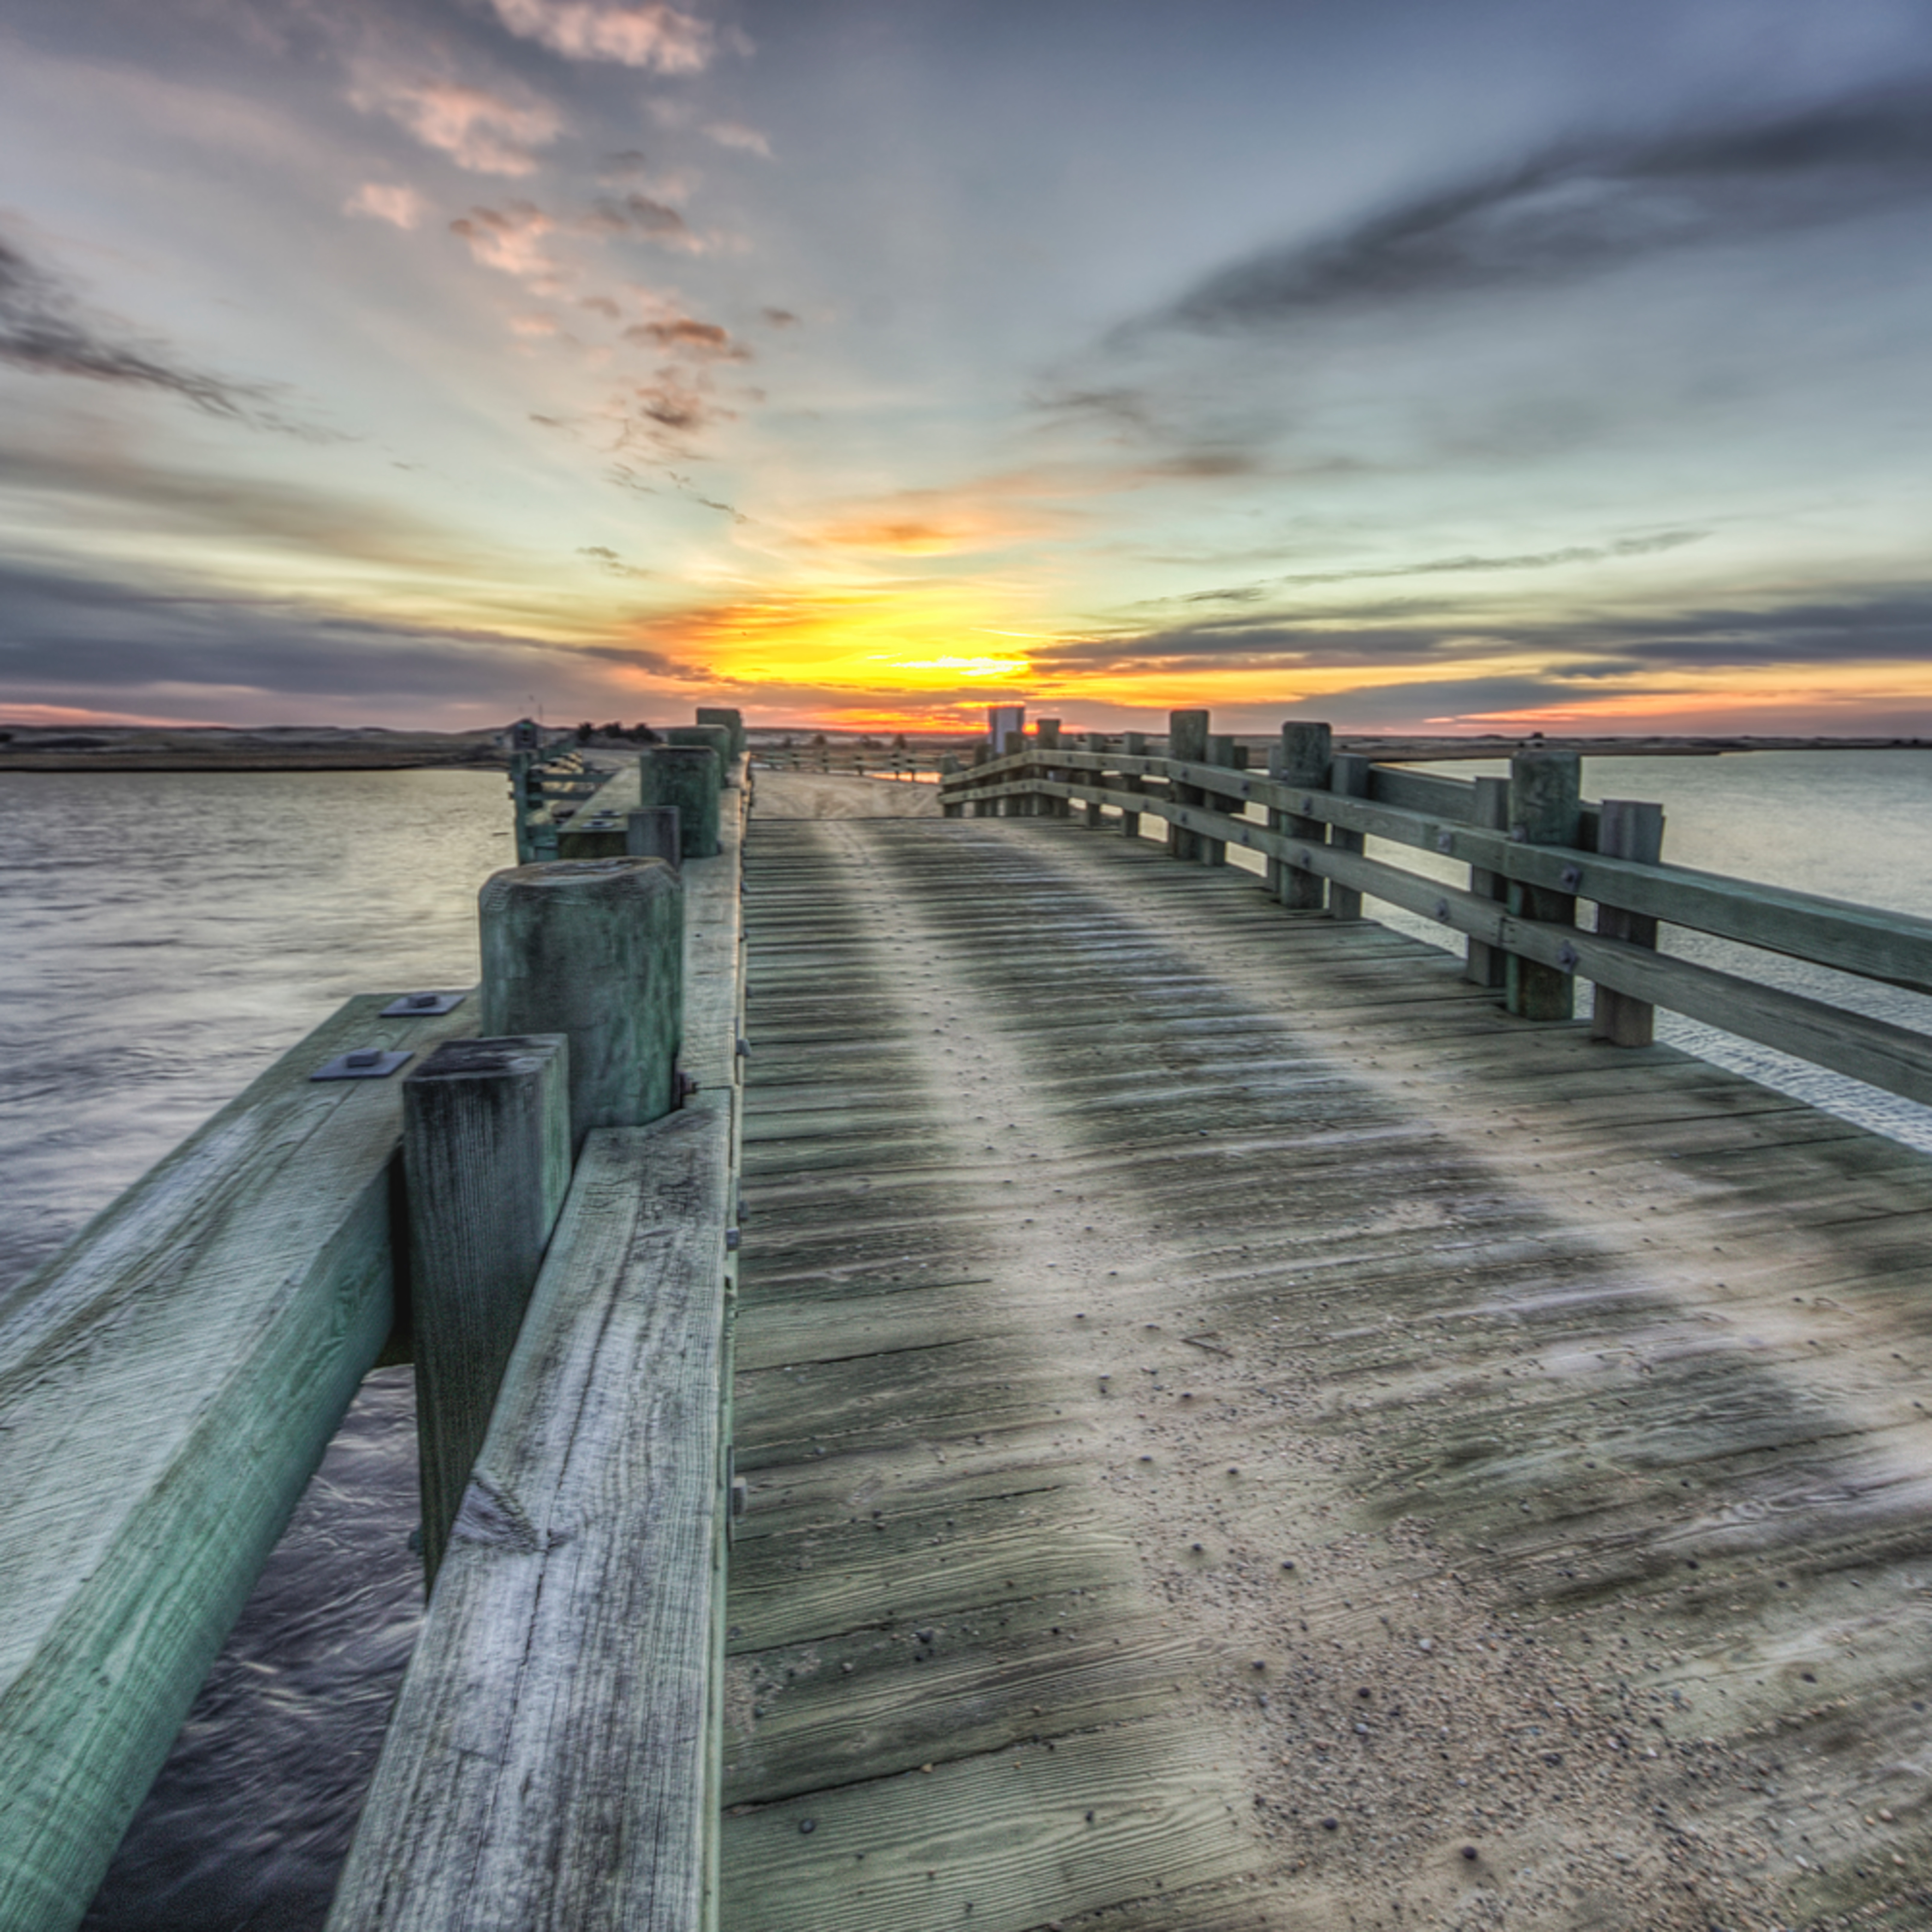 Dyke bridge sunrise sqbg2l